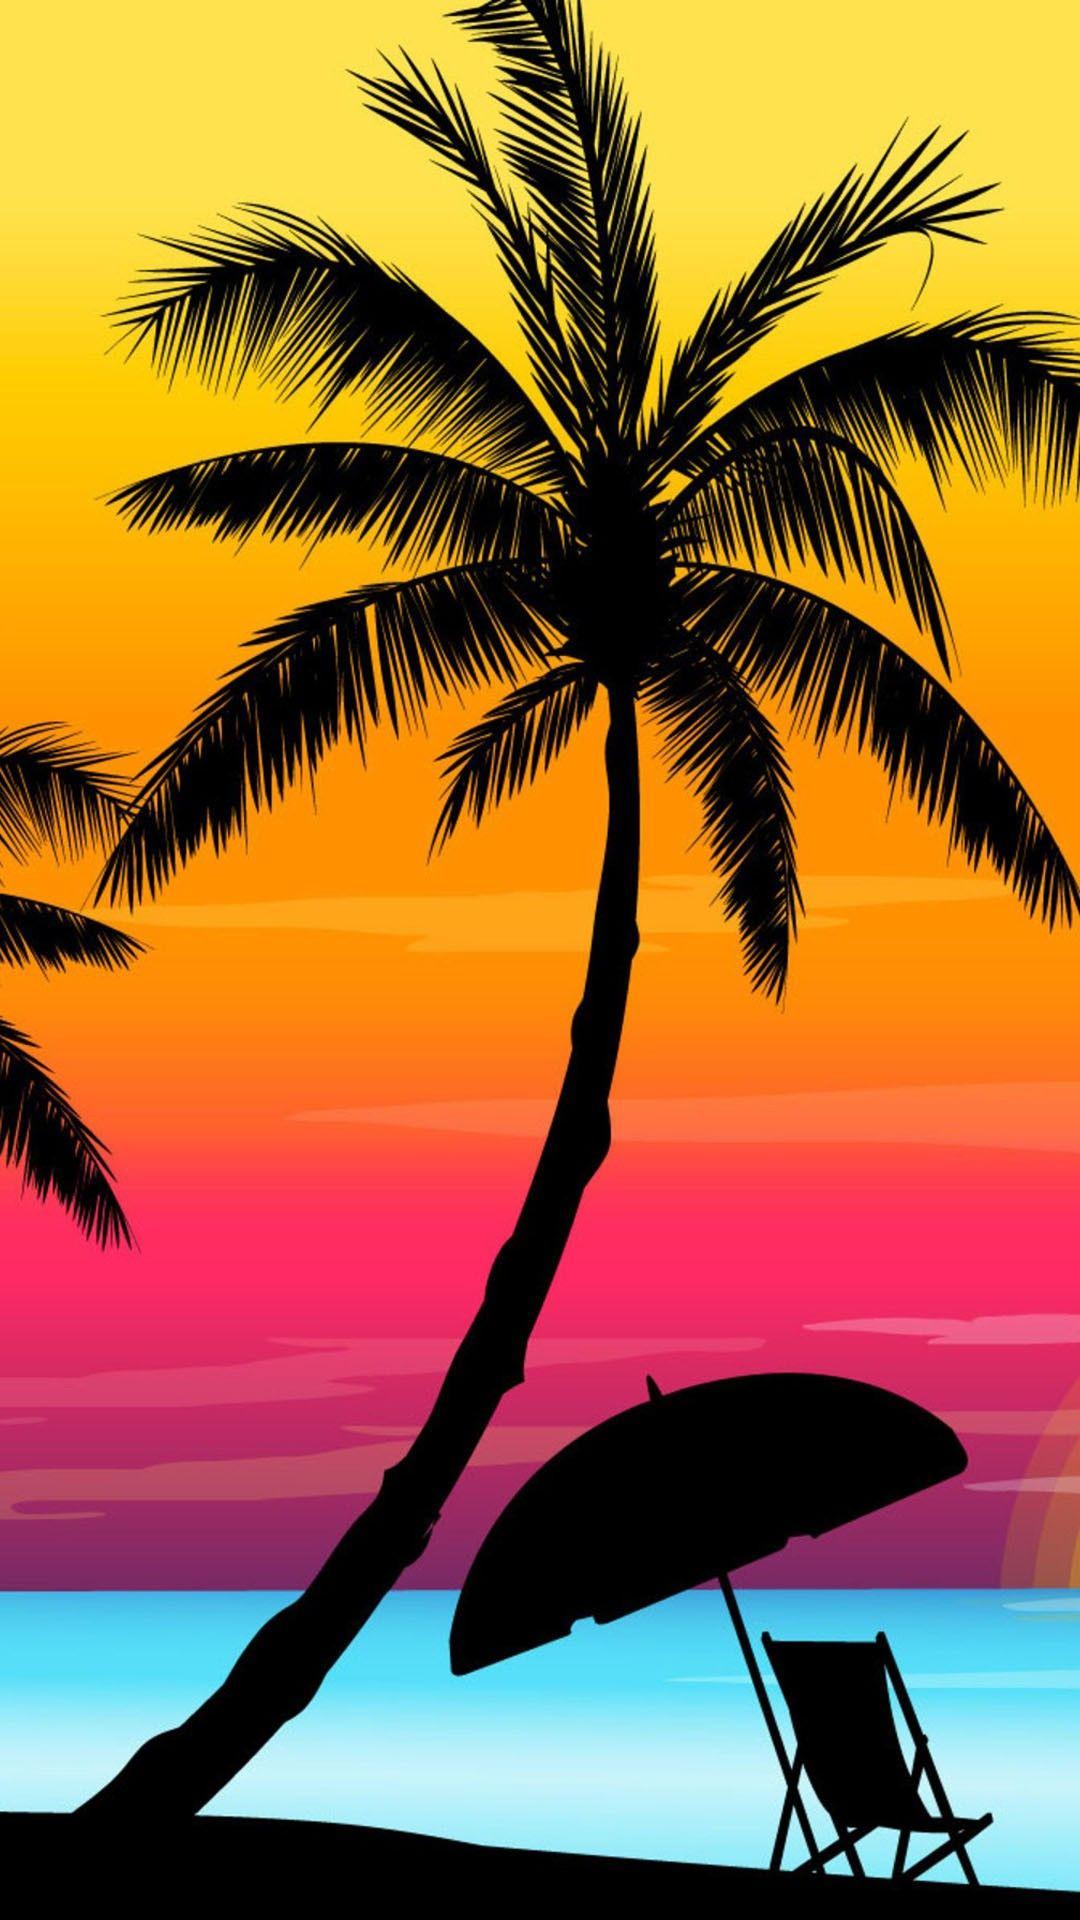 Hd Android Wallpaper Summer